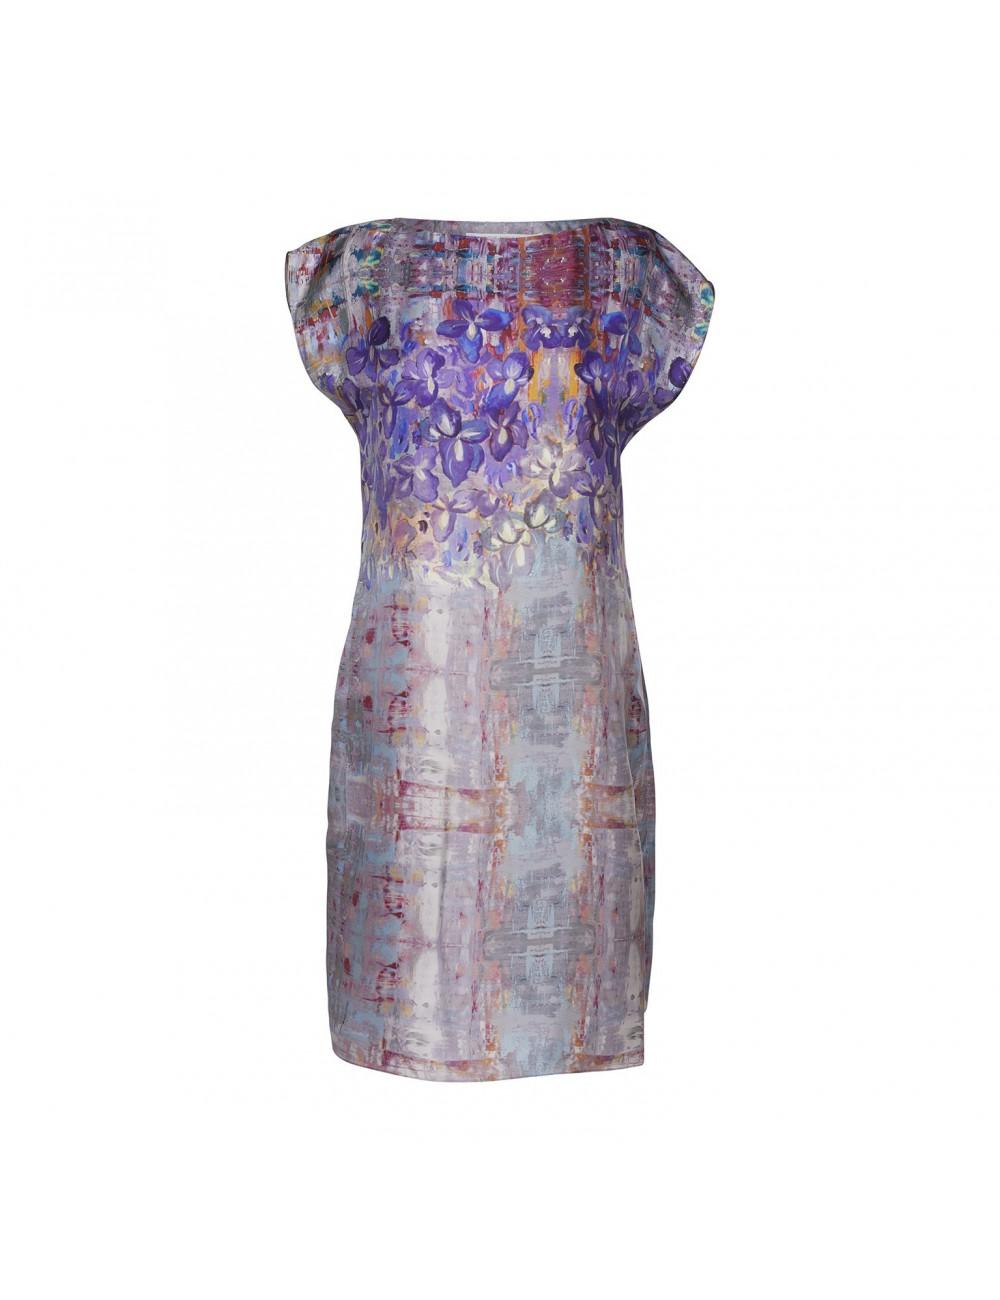 Irises silk dress